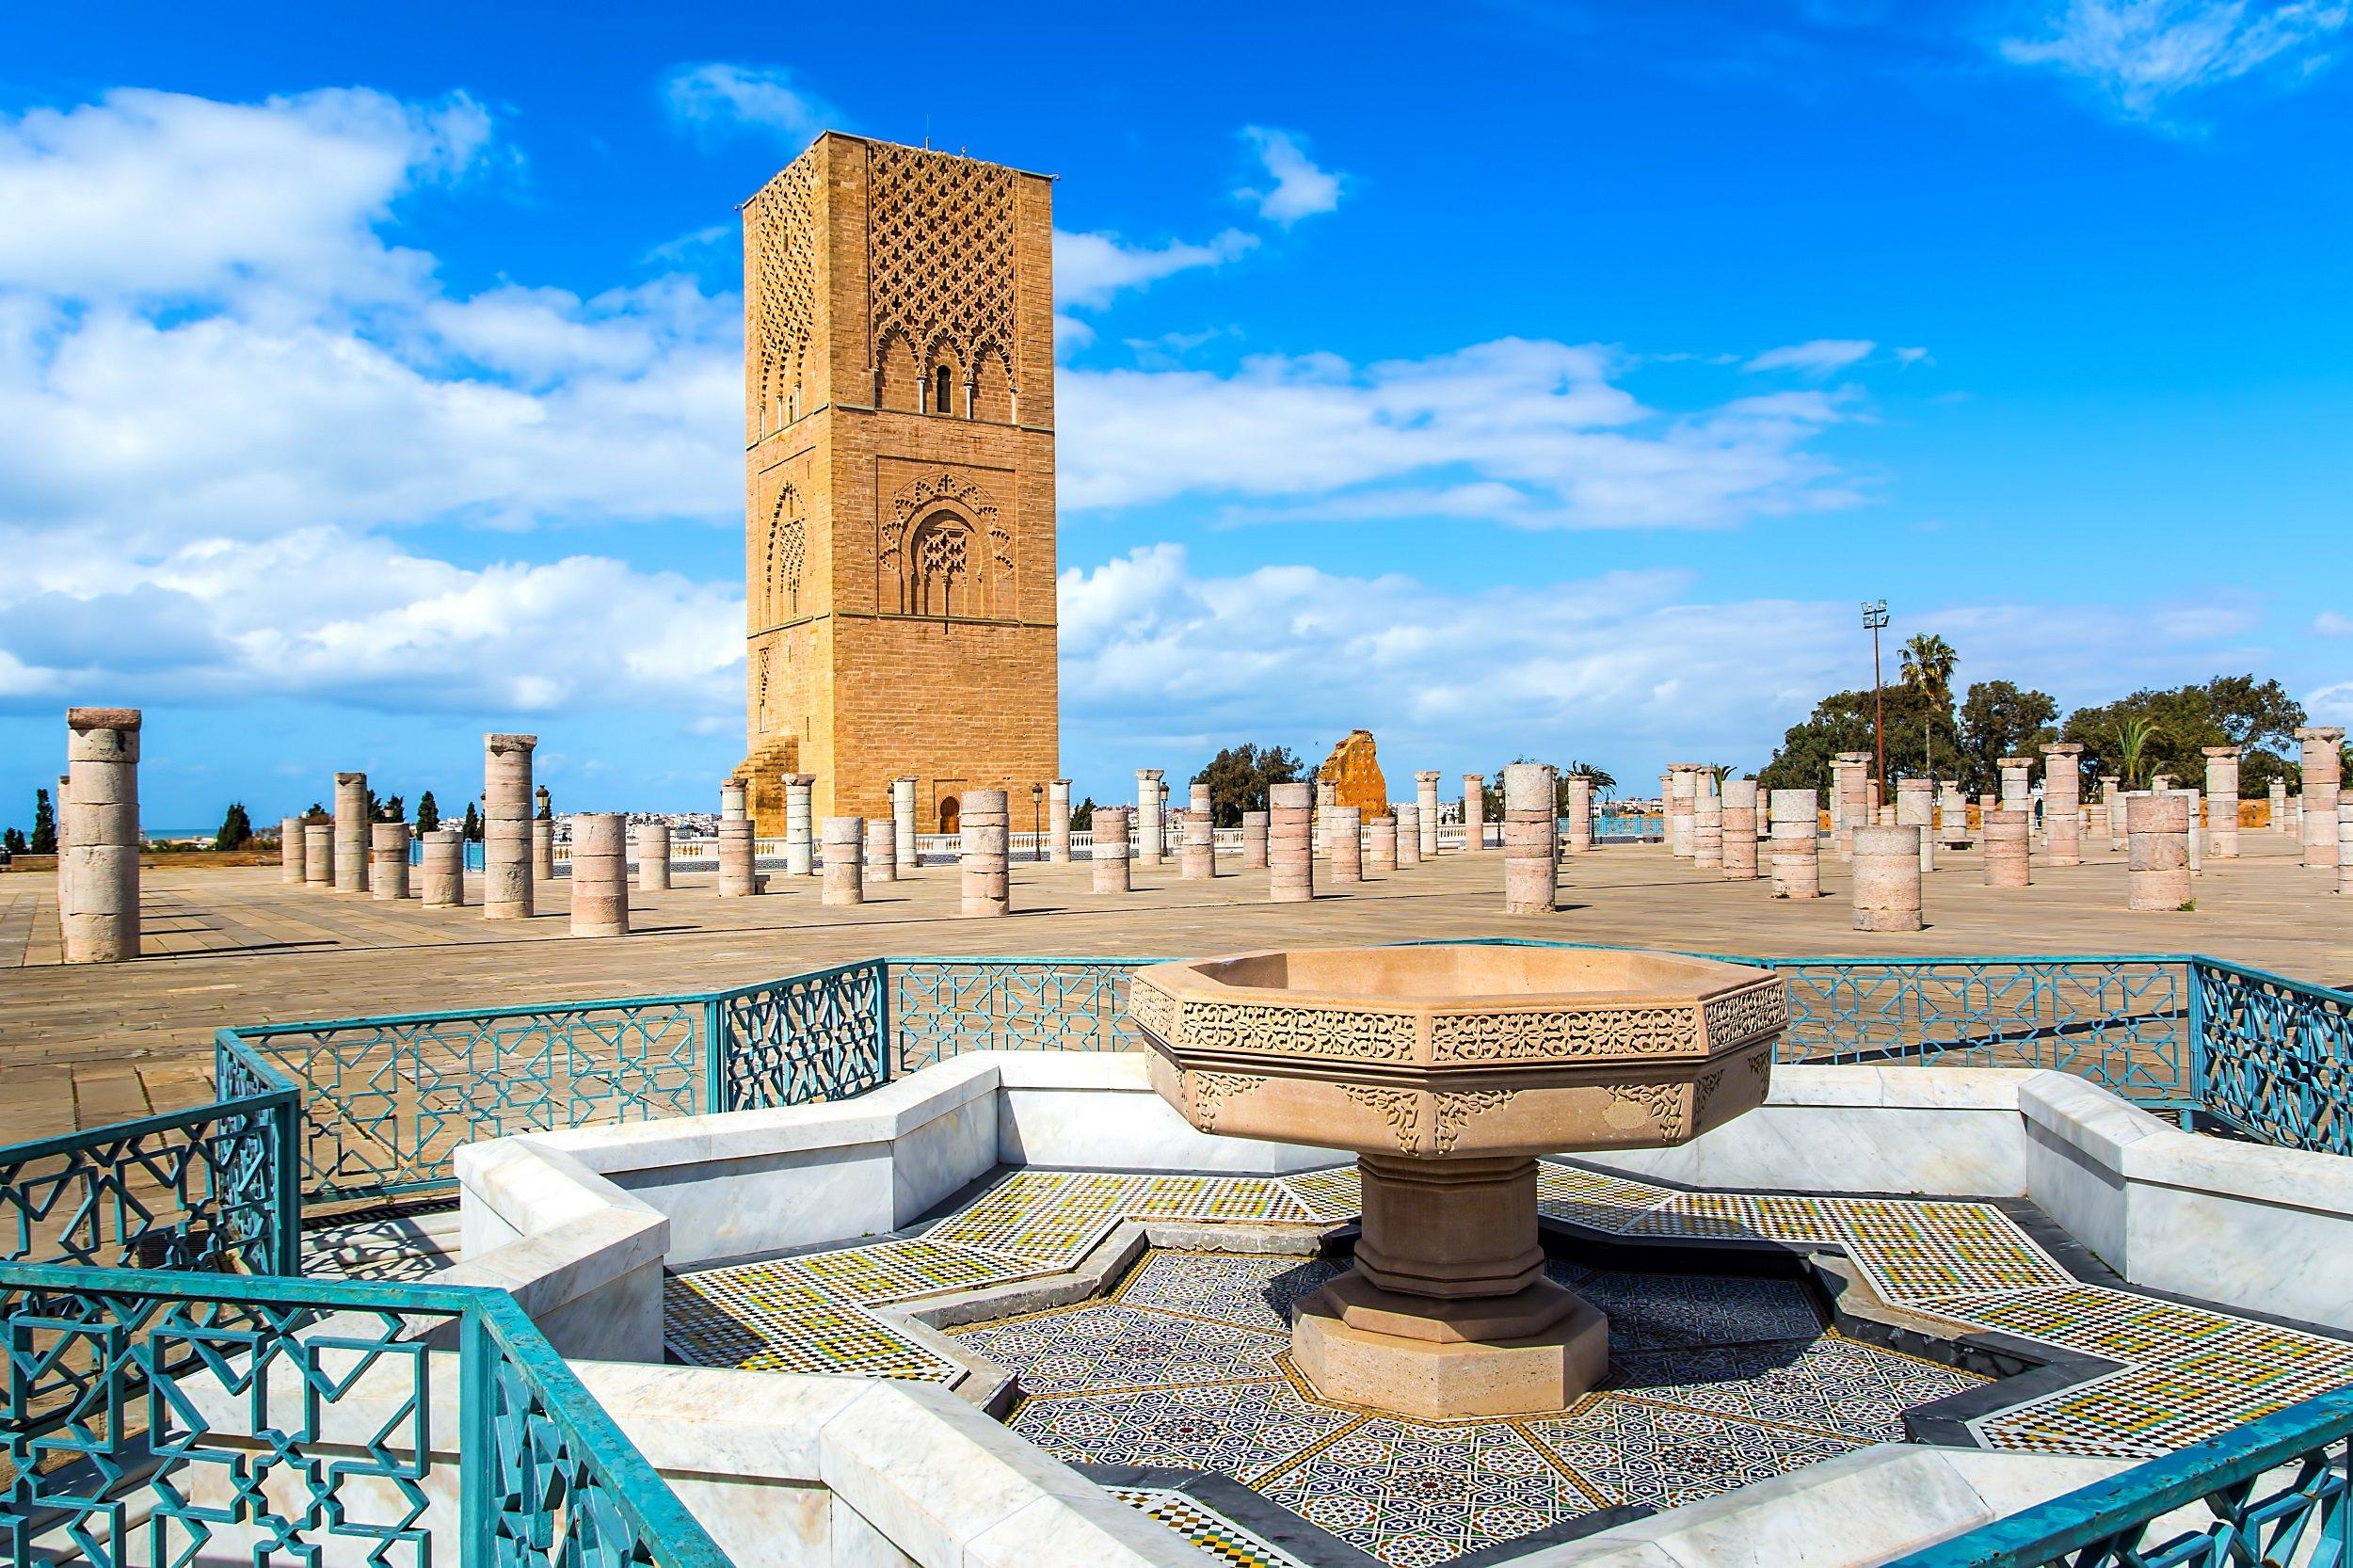 Rabat Travel